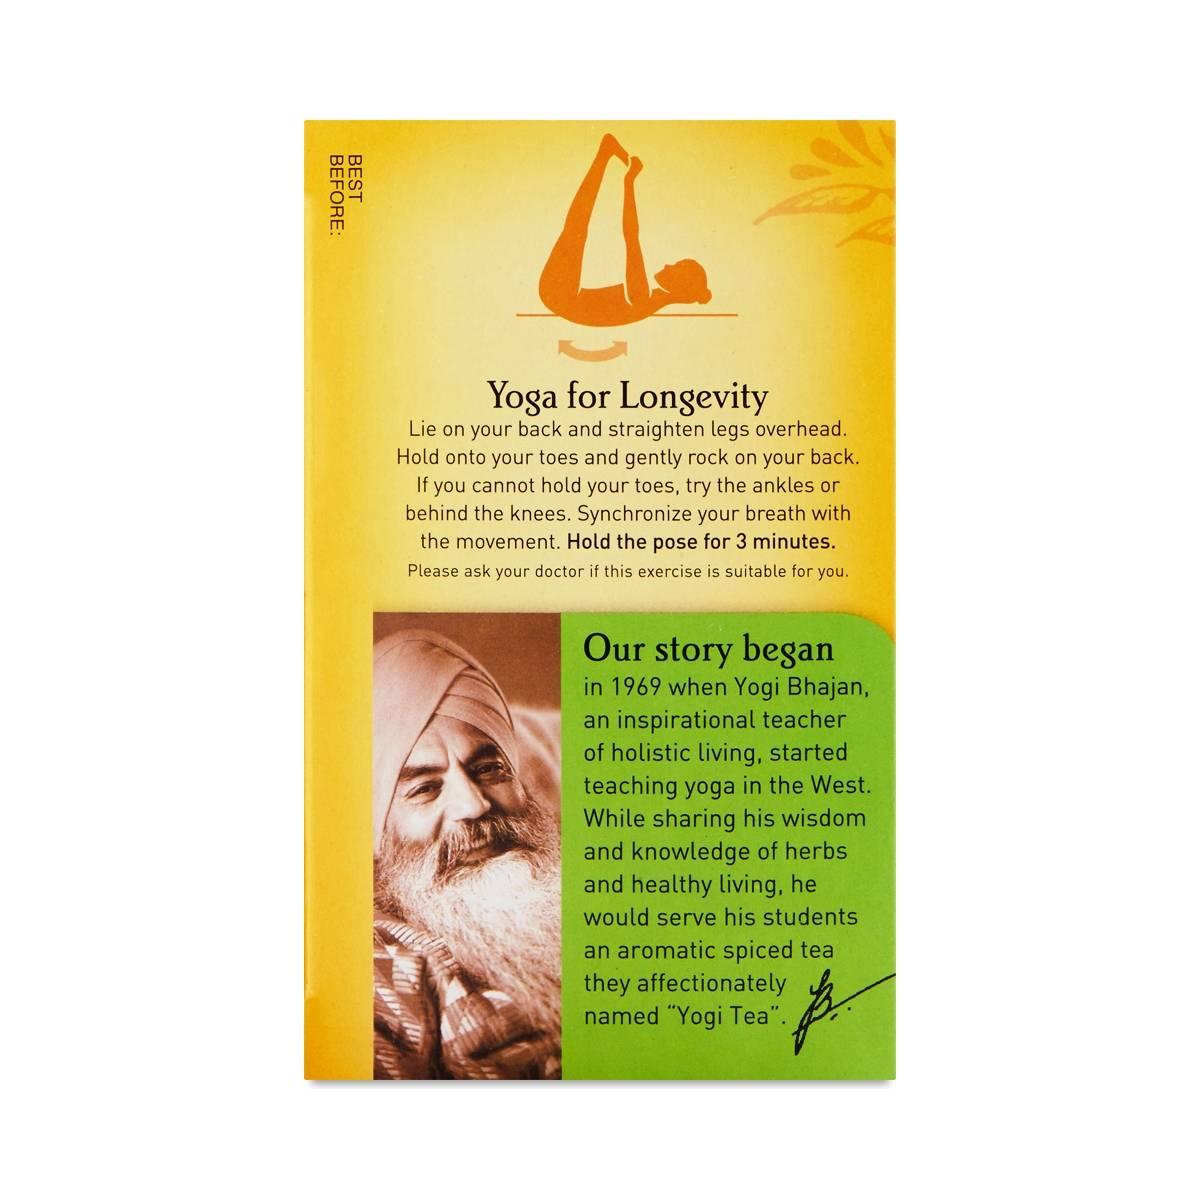 Green Tea Super Antioxidant by Yogi Tea - Thrive Market